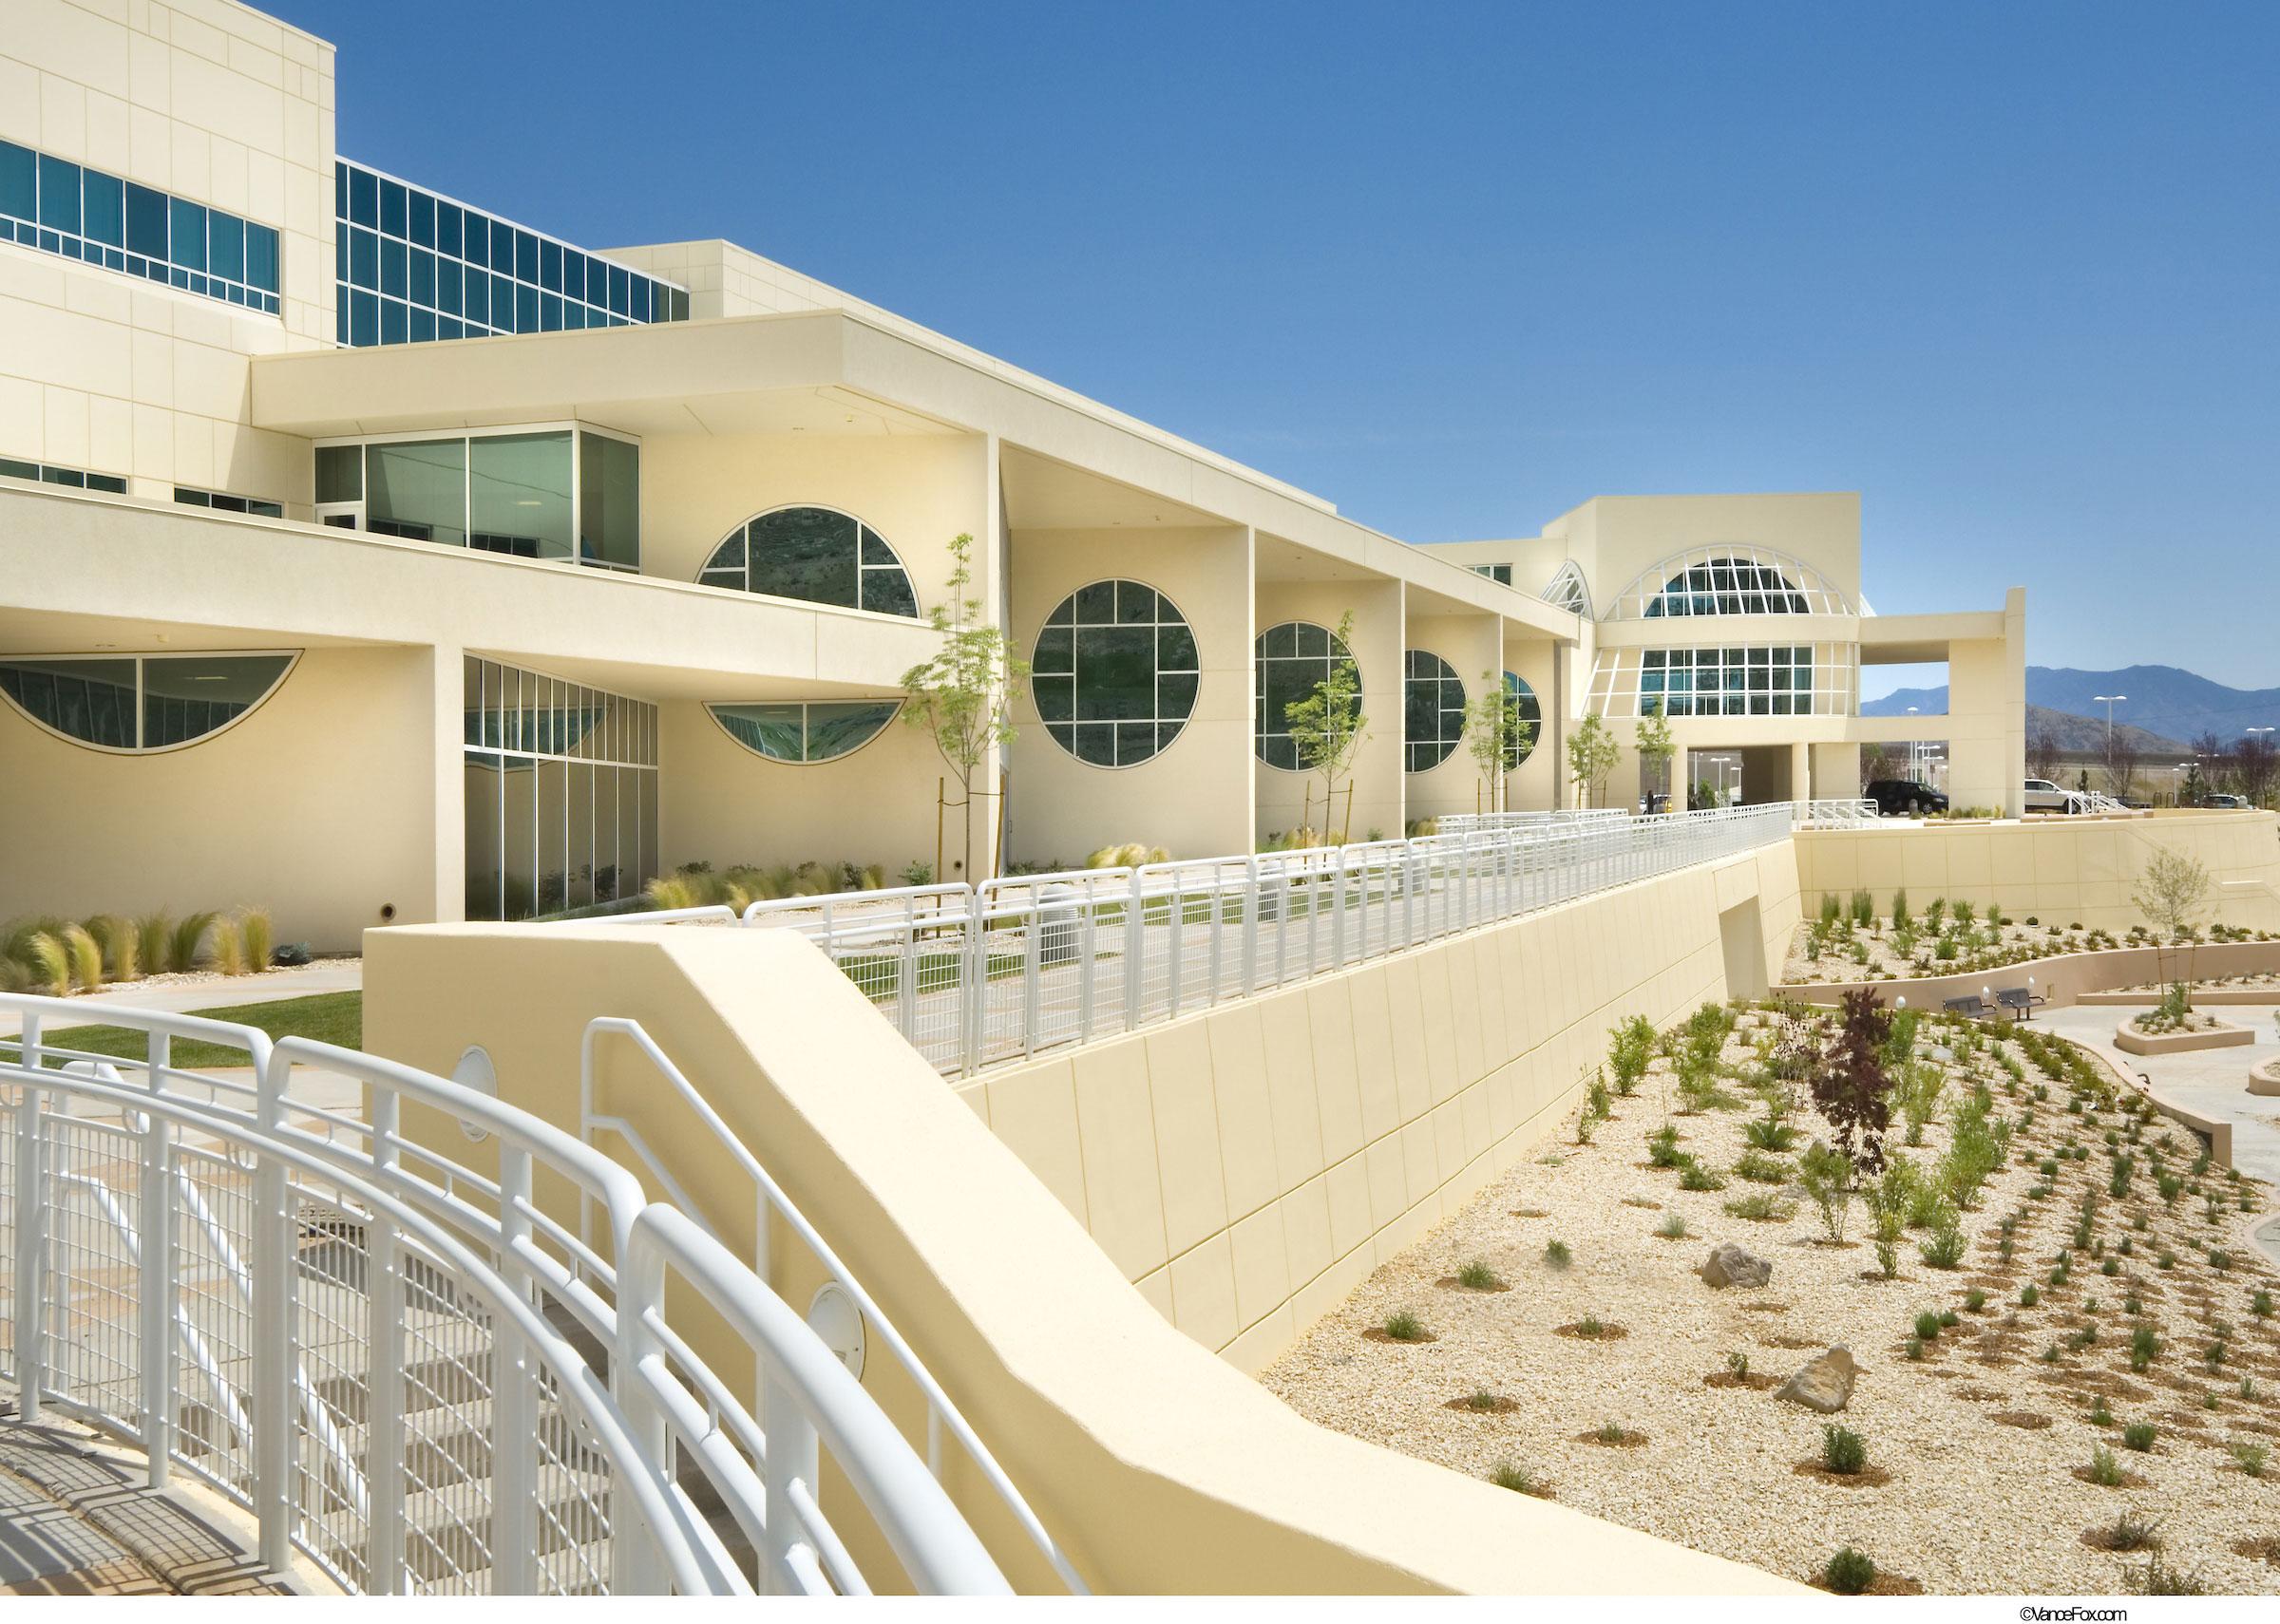 Carson Tahoe Regional Medical Center Carson City Nevada